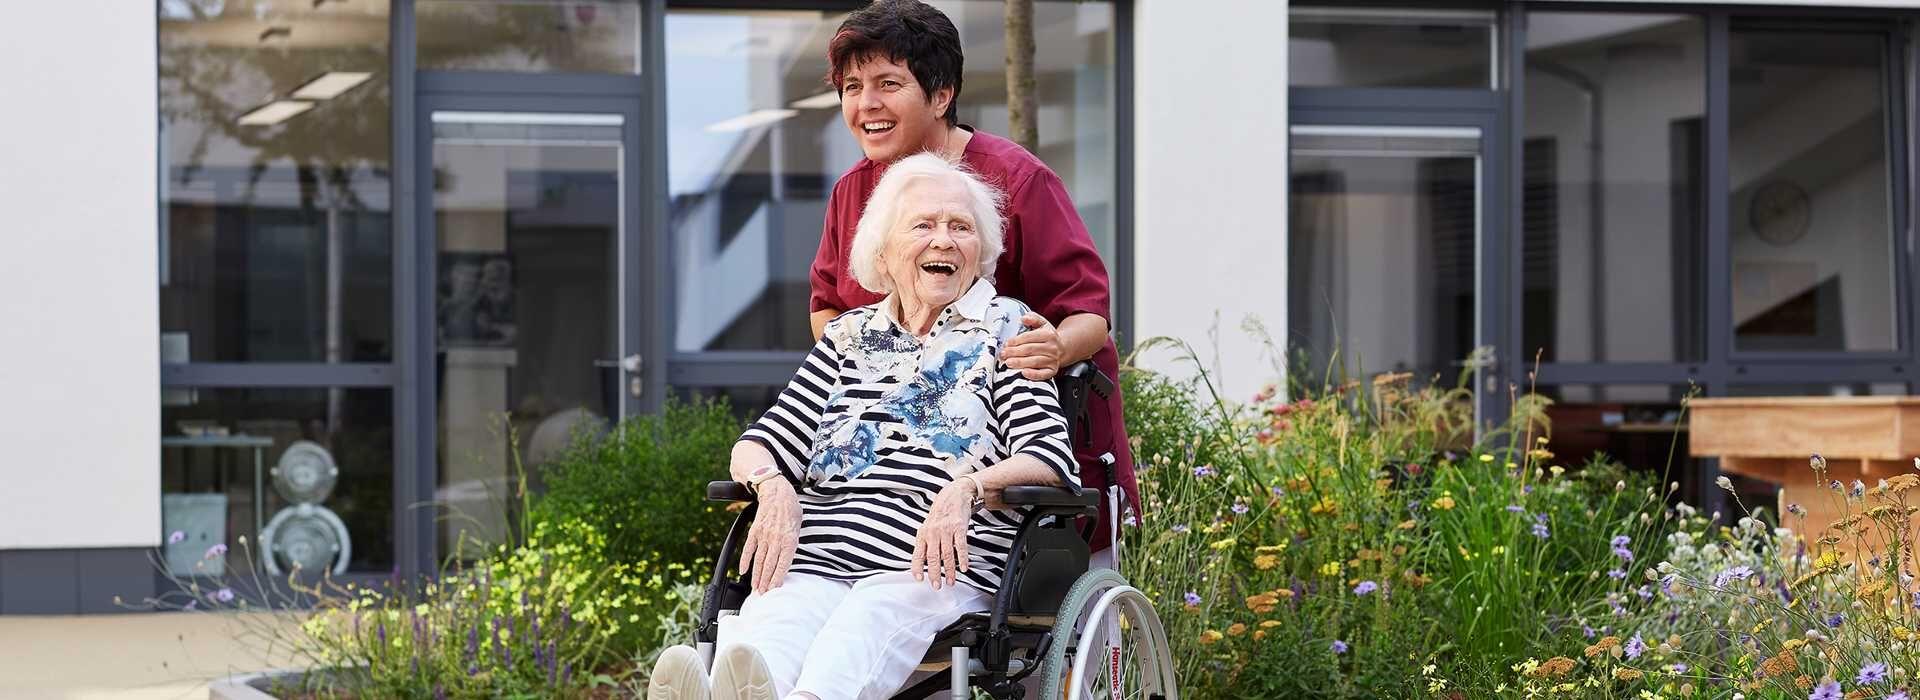 Stiftung Bürgerspital, Seniorenheime_Hero